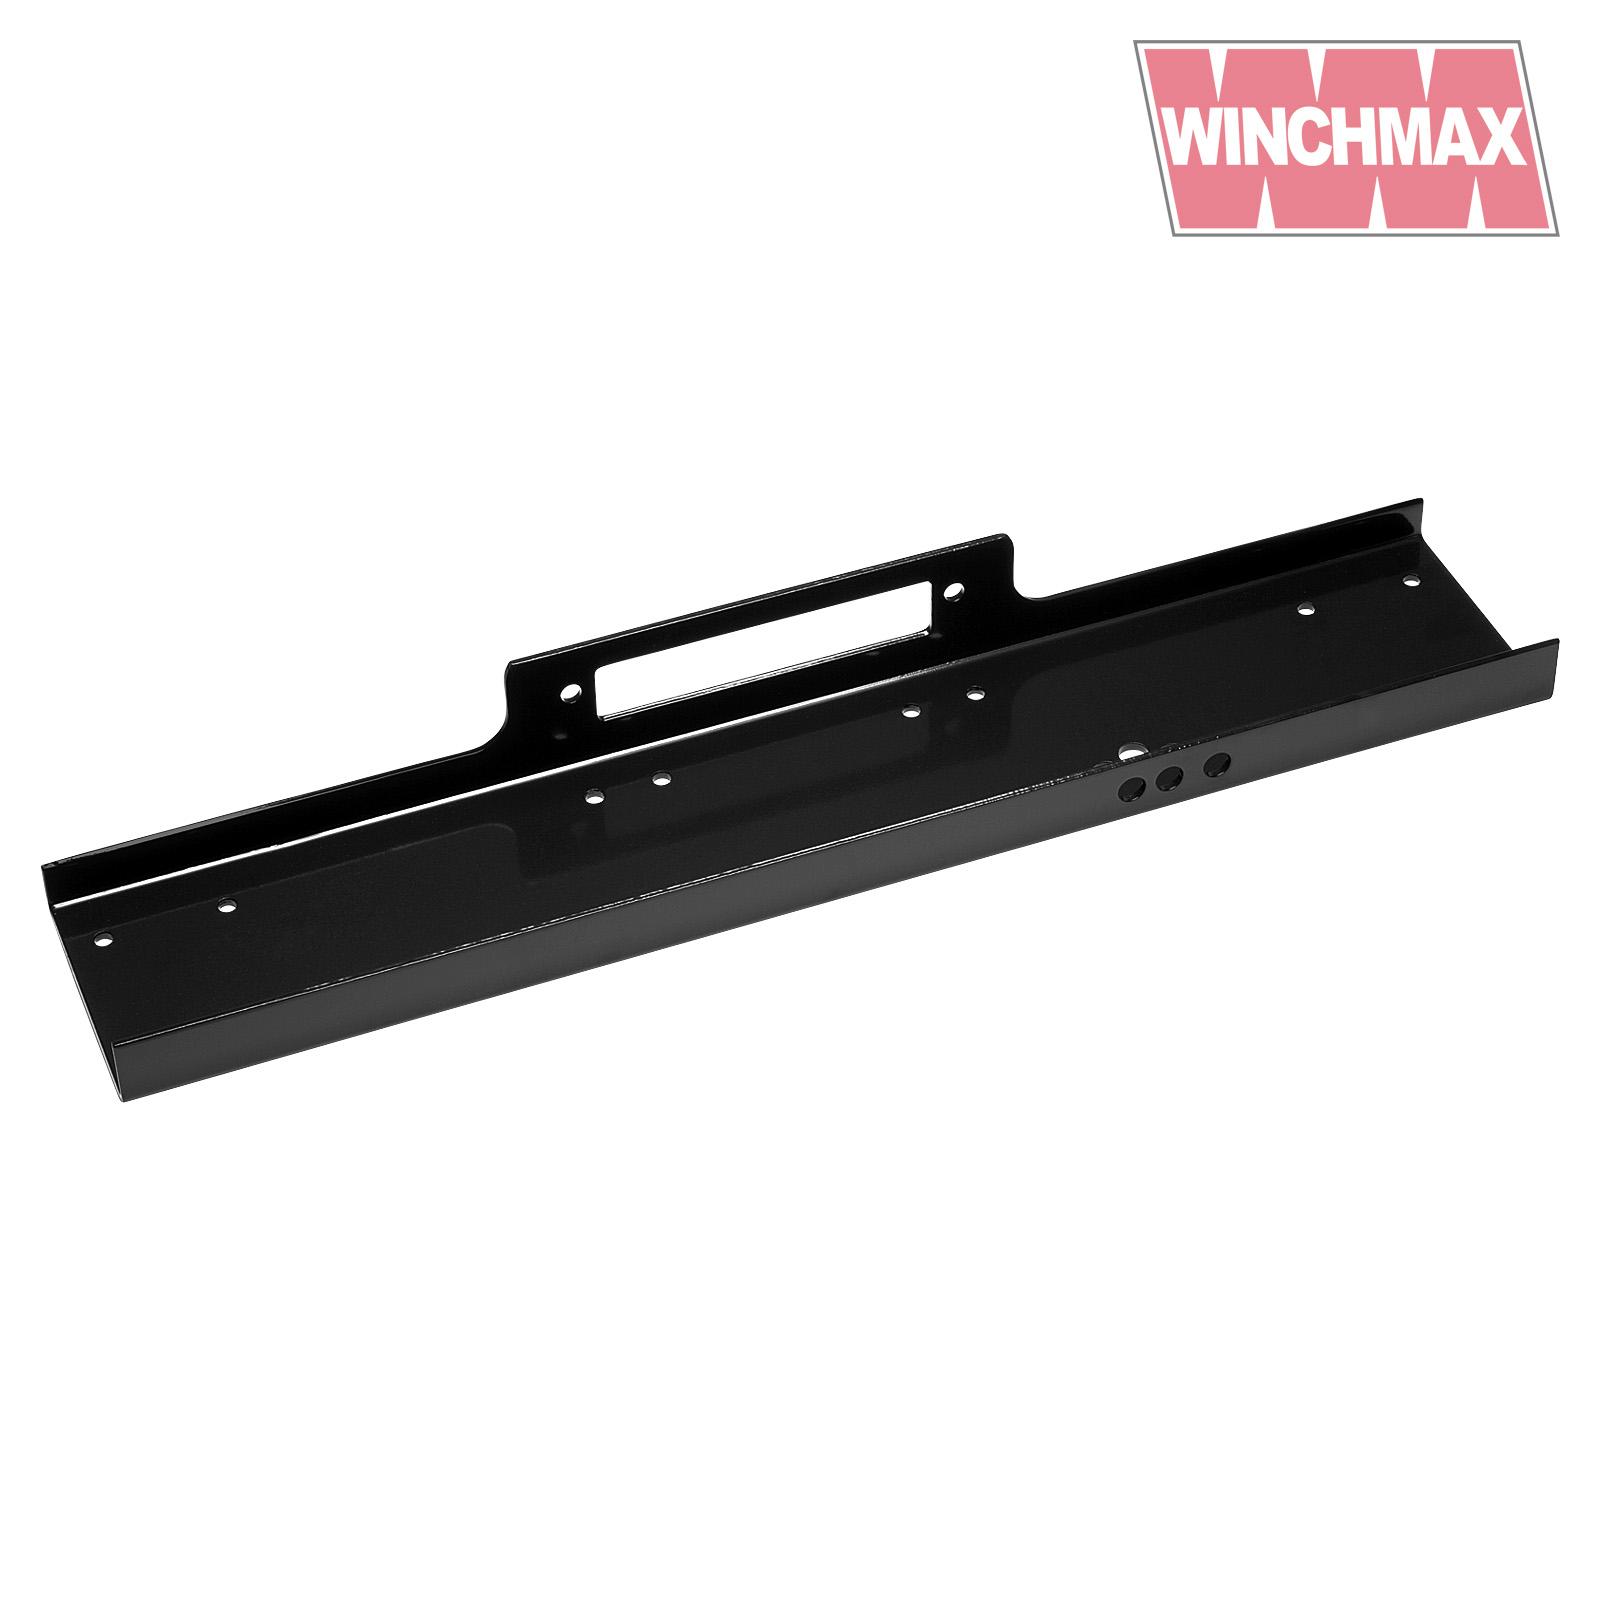 Wmmp2 winchmax 640